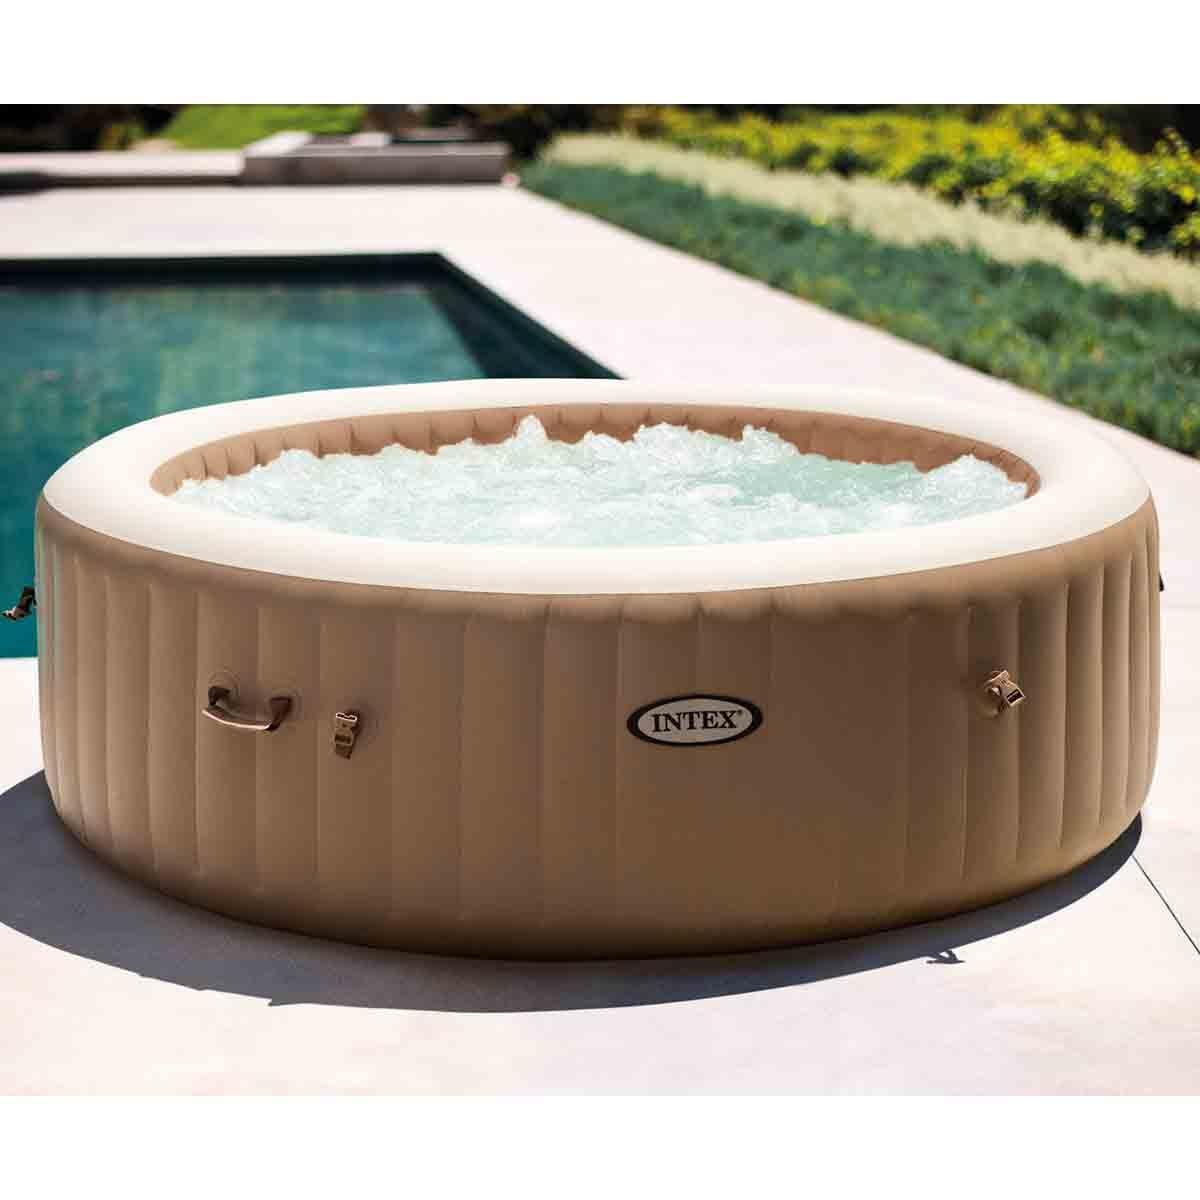 Intex PureSpa 6-person Bubble Hot Tub